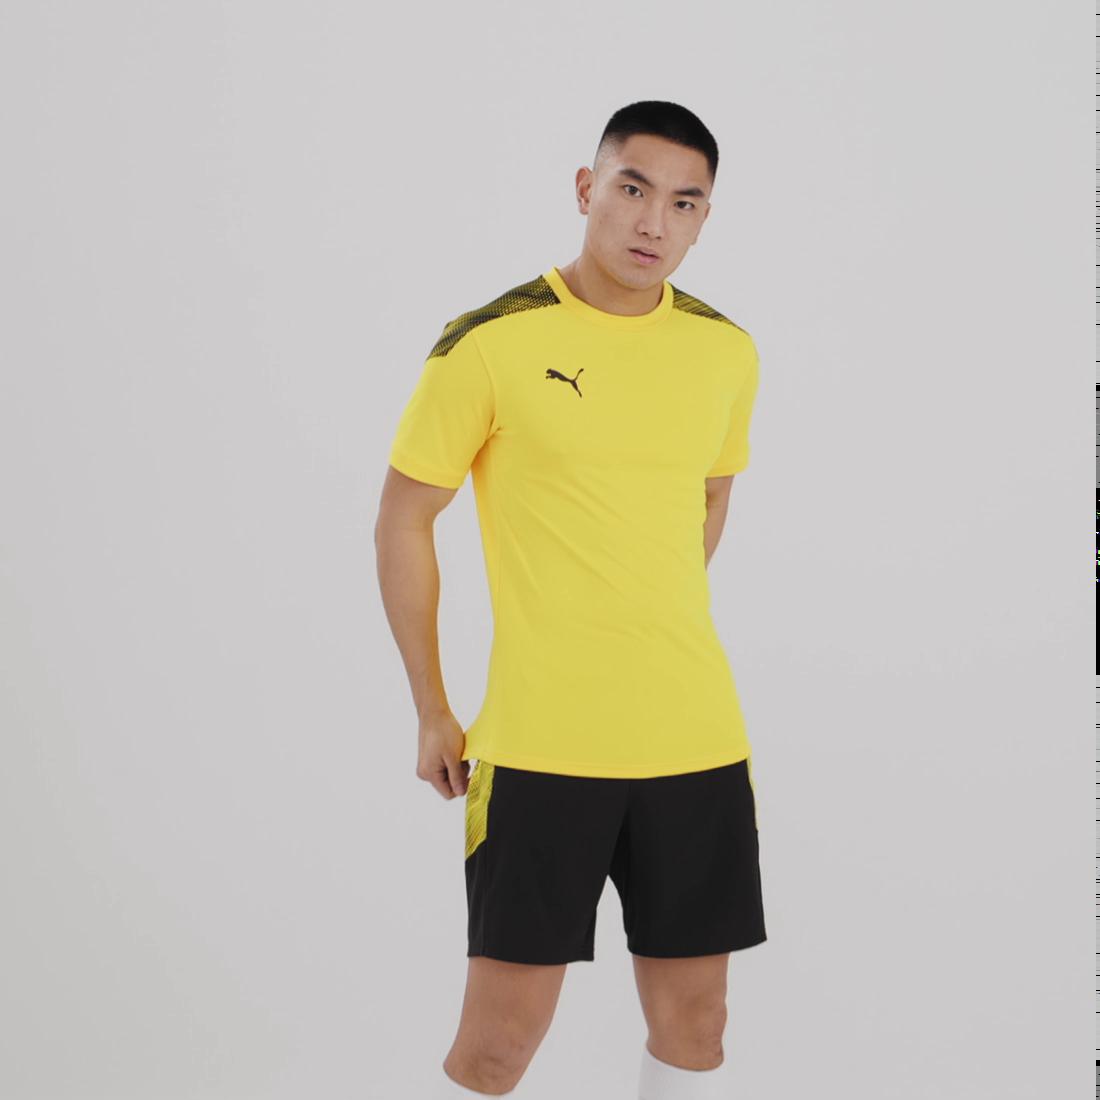 Image PUMA Camiseta ftblNXT Pro Masculina #6